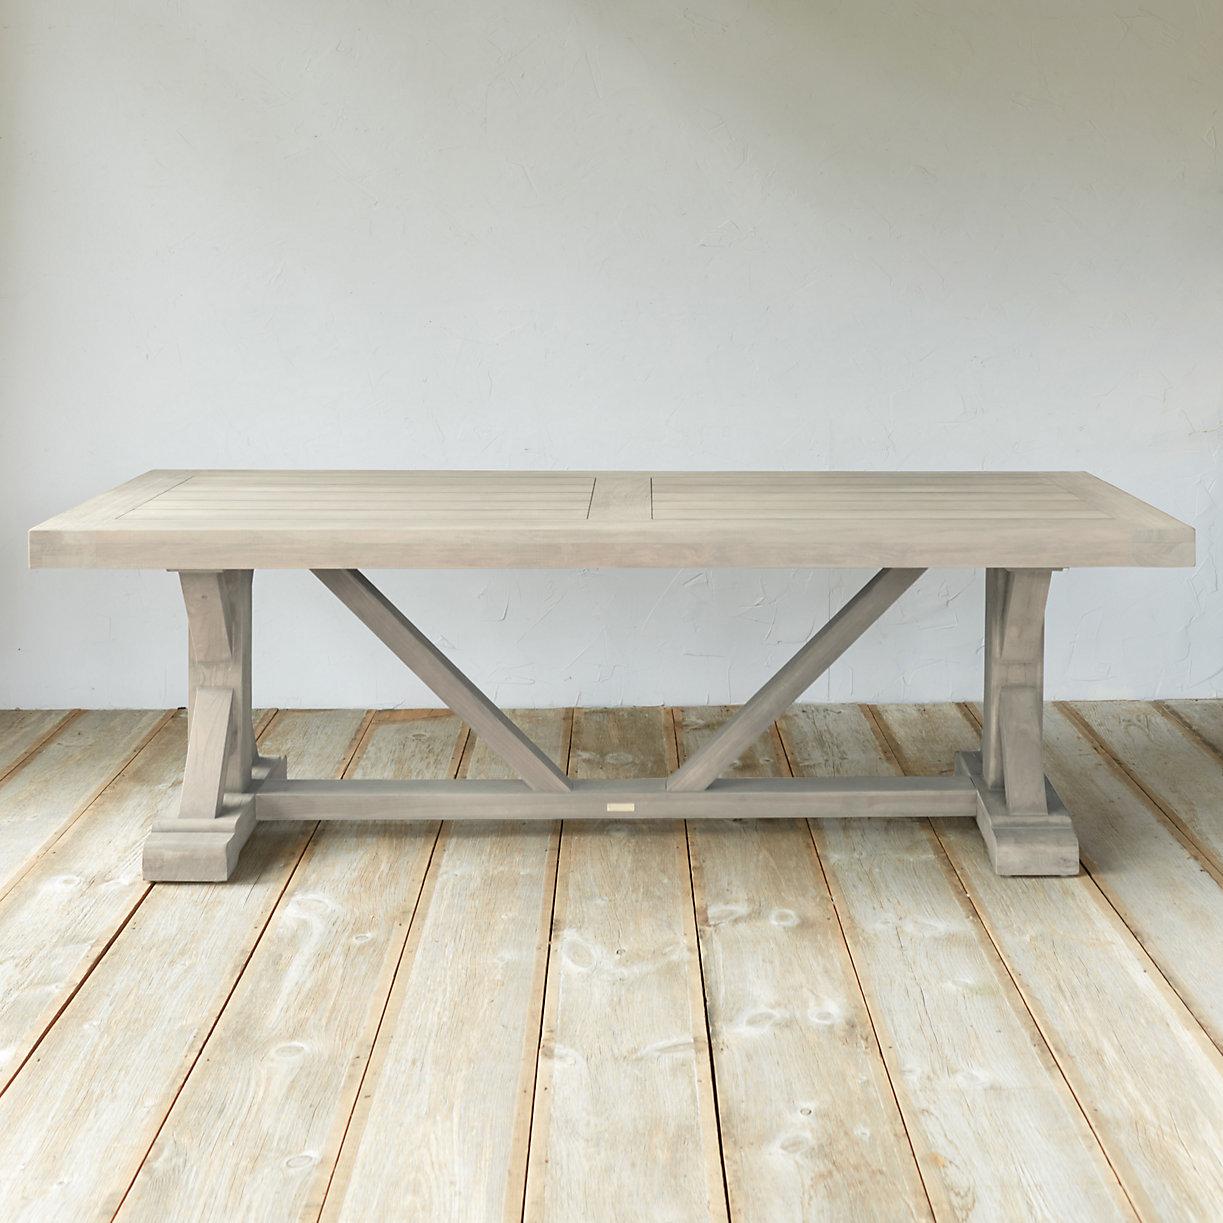 Protected Teak Trestle Dining Table 8 Terrain